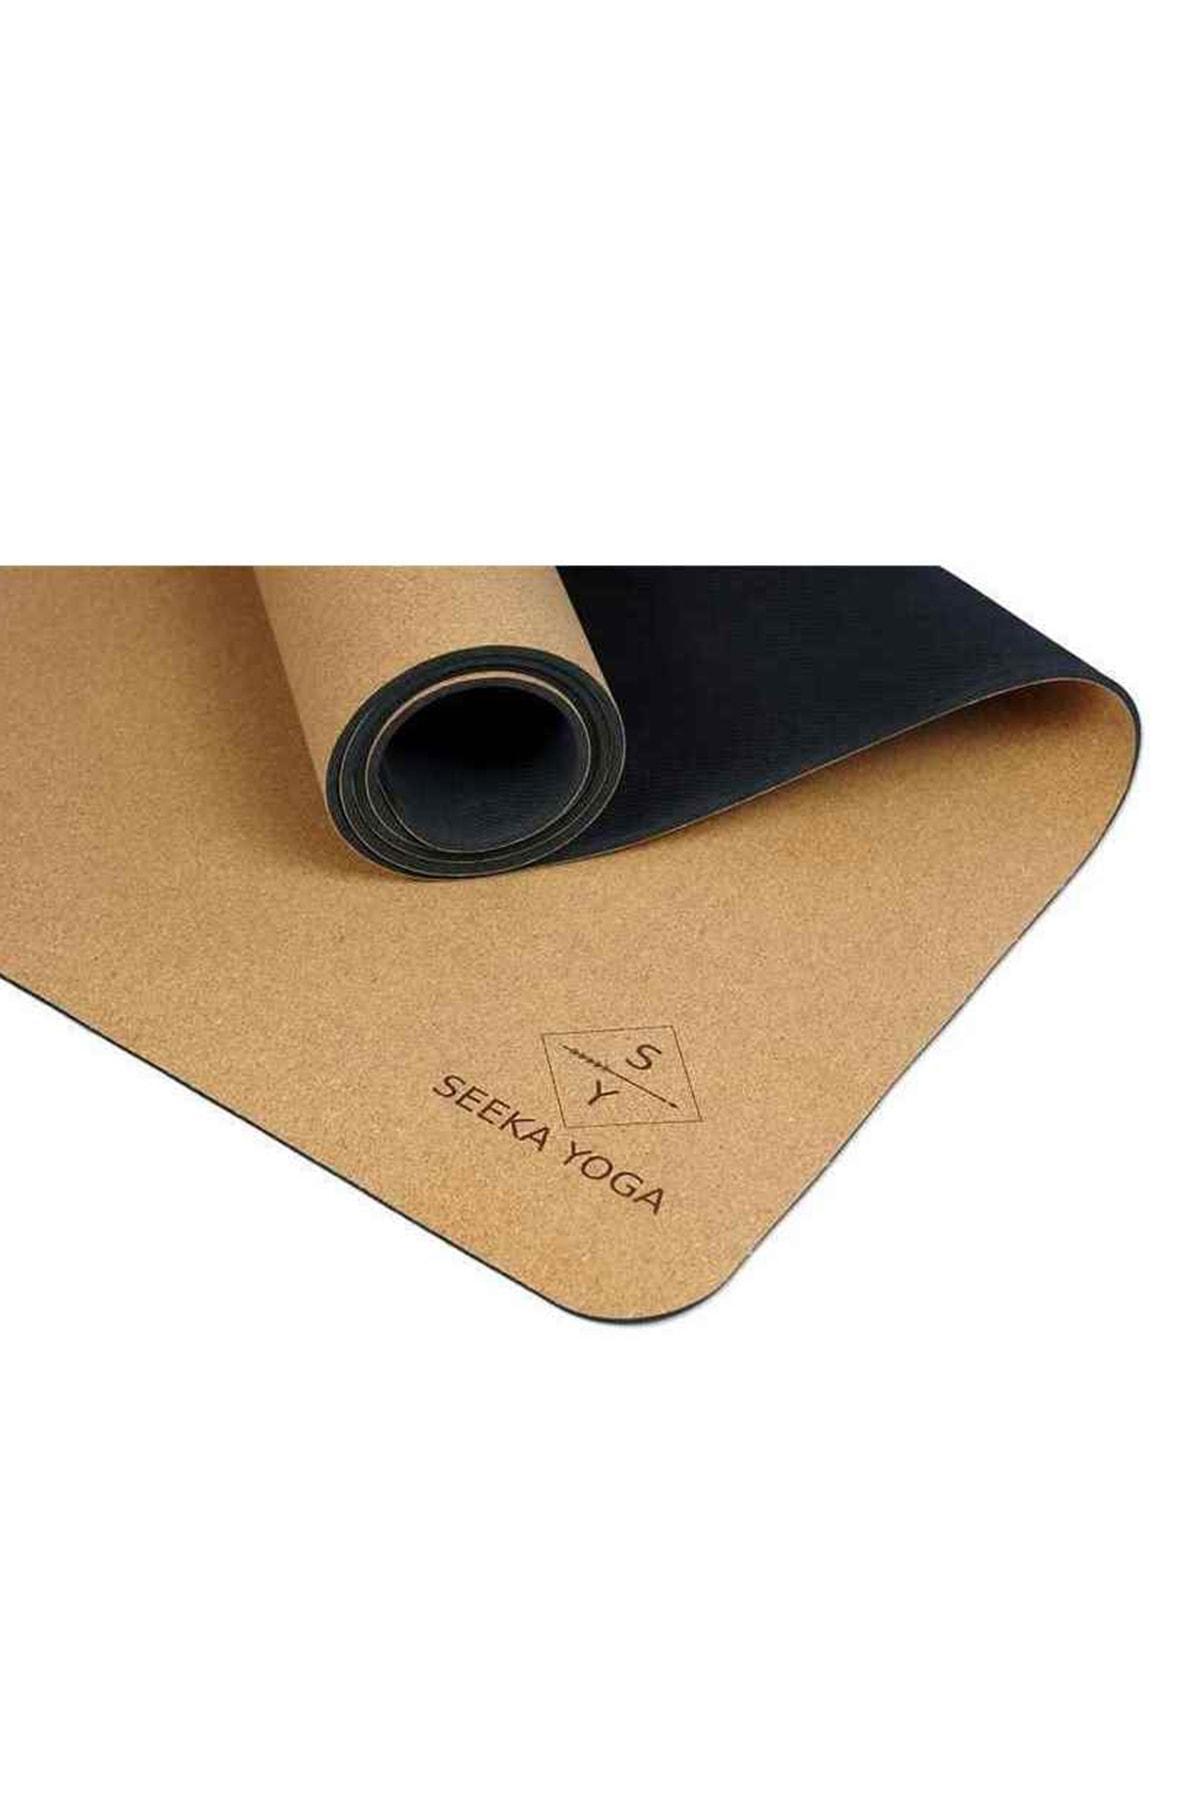 Seeka Yoga Mantar Yüzeyli Doğal Kauçuk Yoga Matı 3